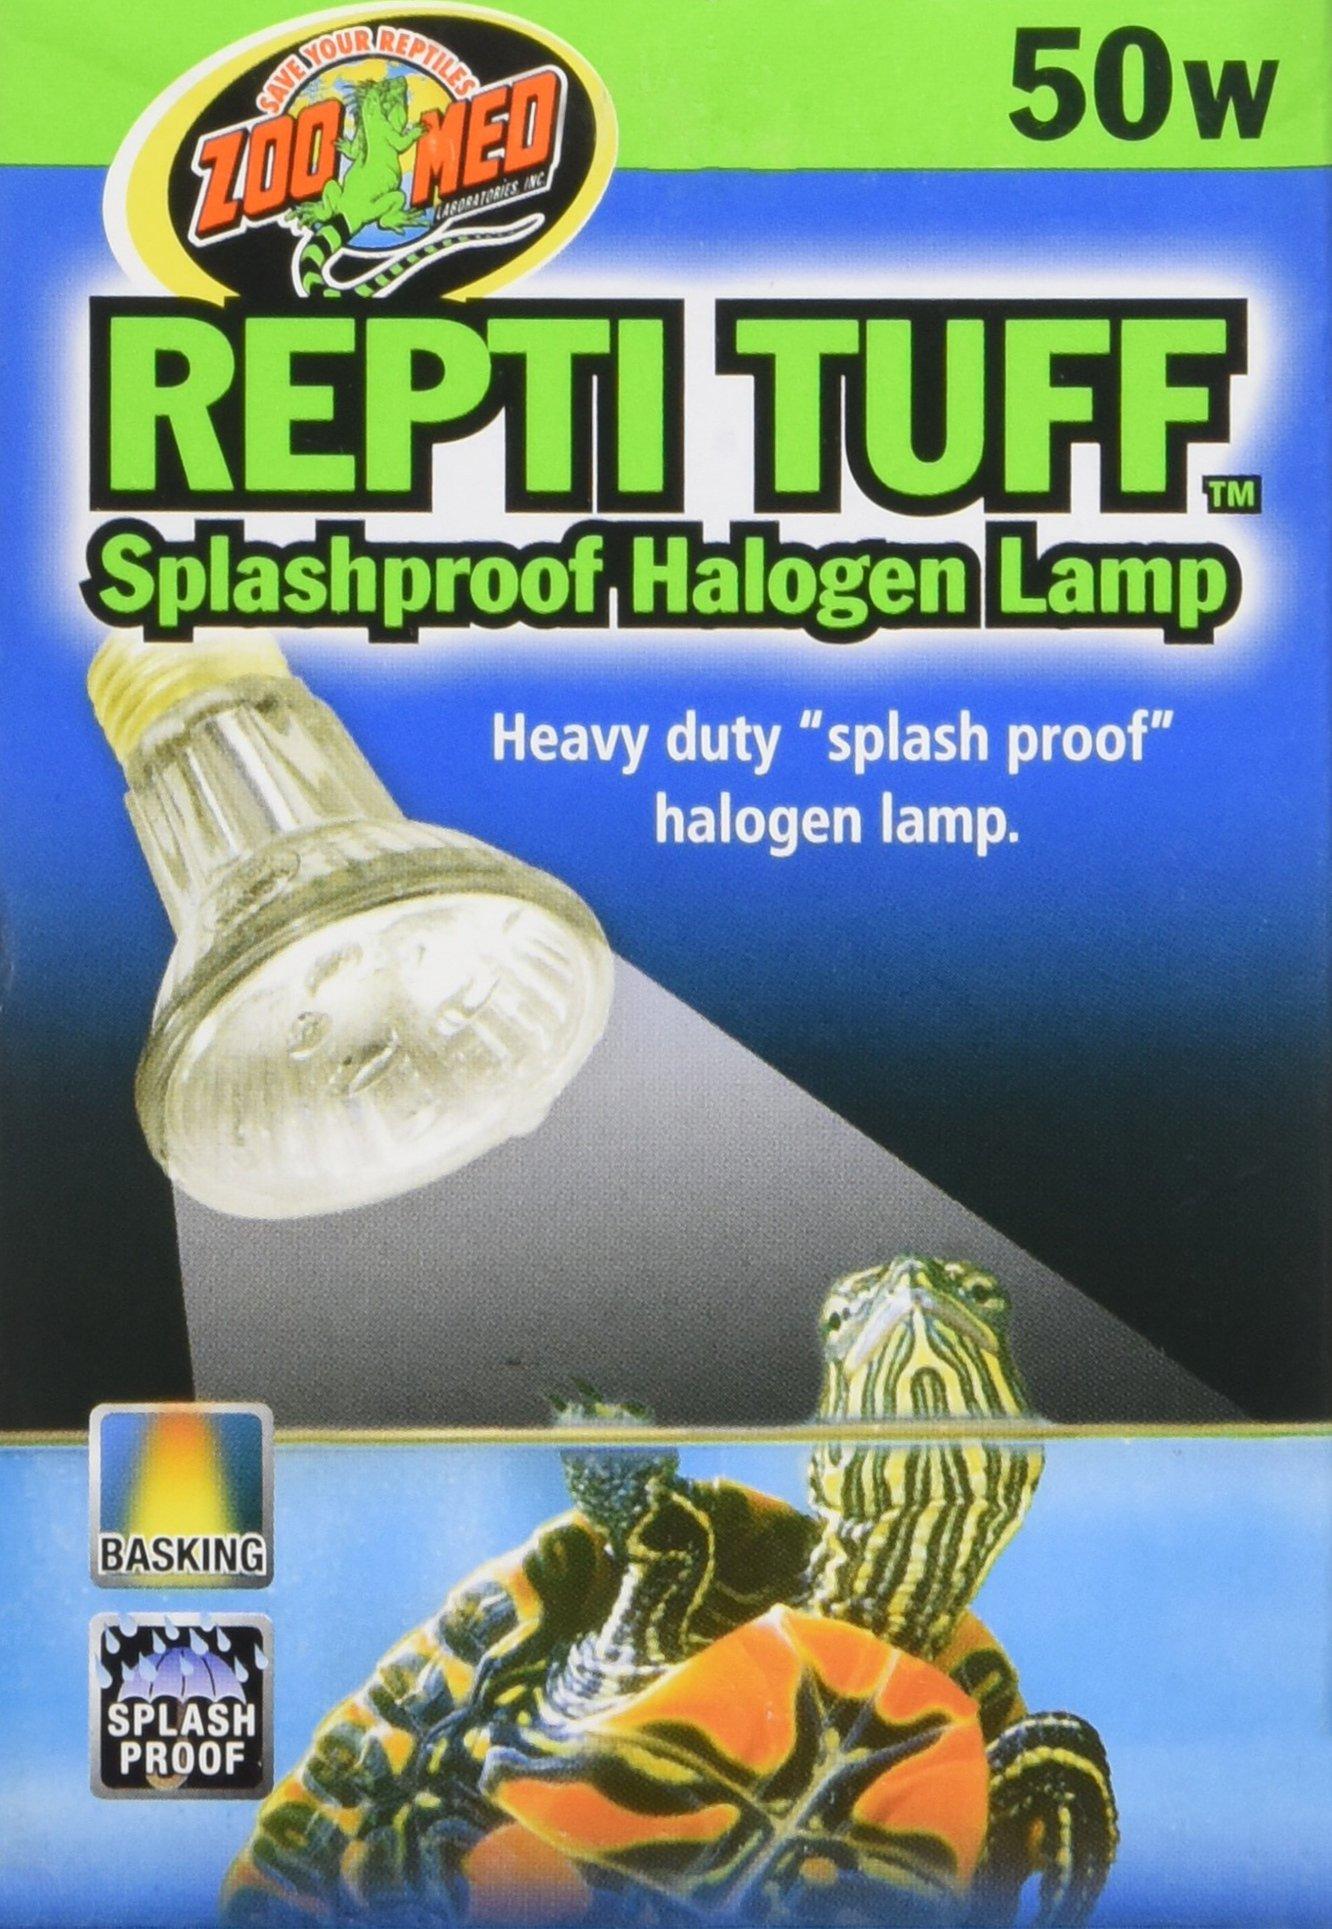 Zoo Med Repti Tuff Splashproof Halogen Lamp 50 Watts by Zoo Med (Image #2)